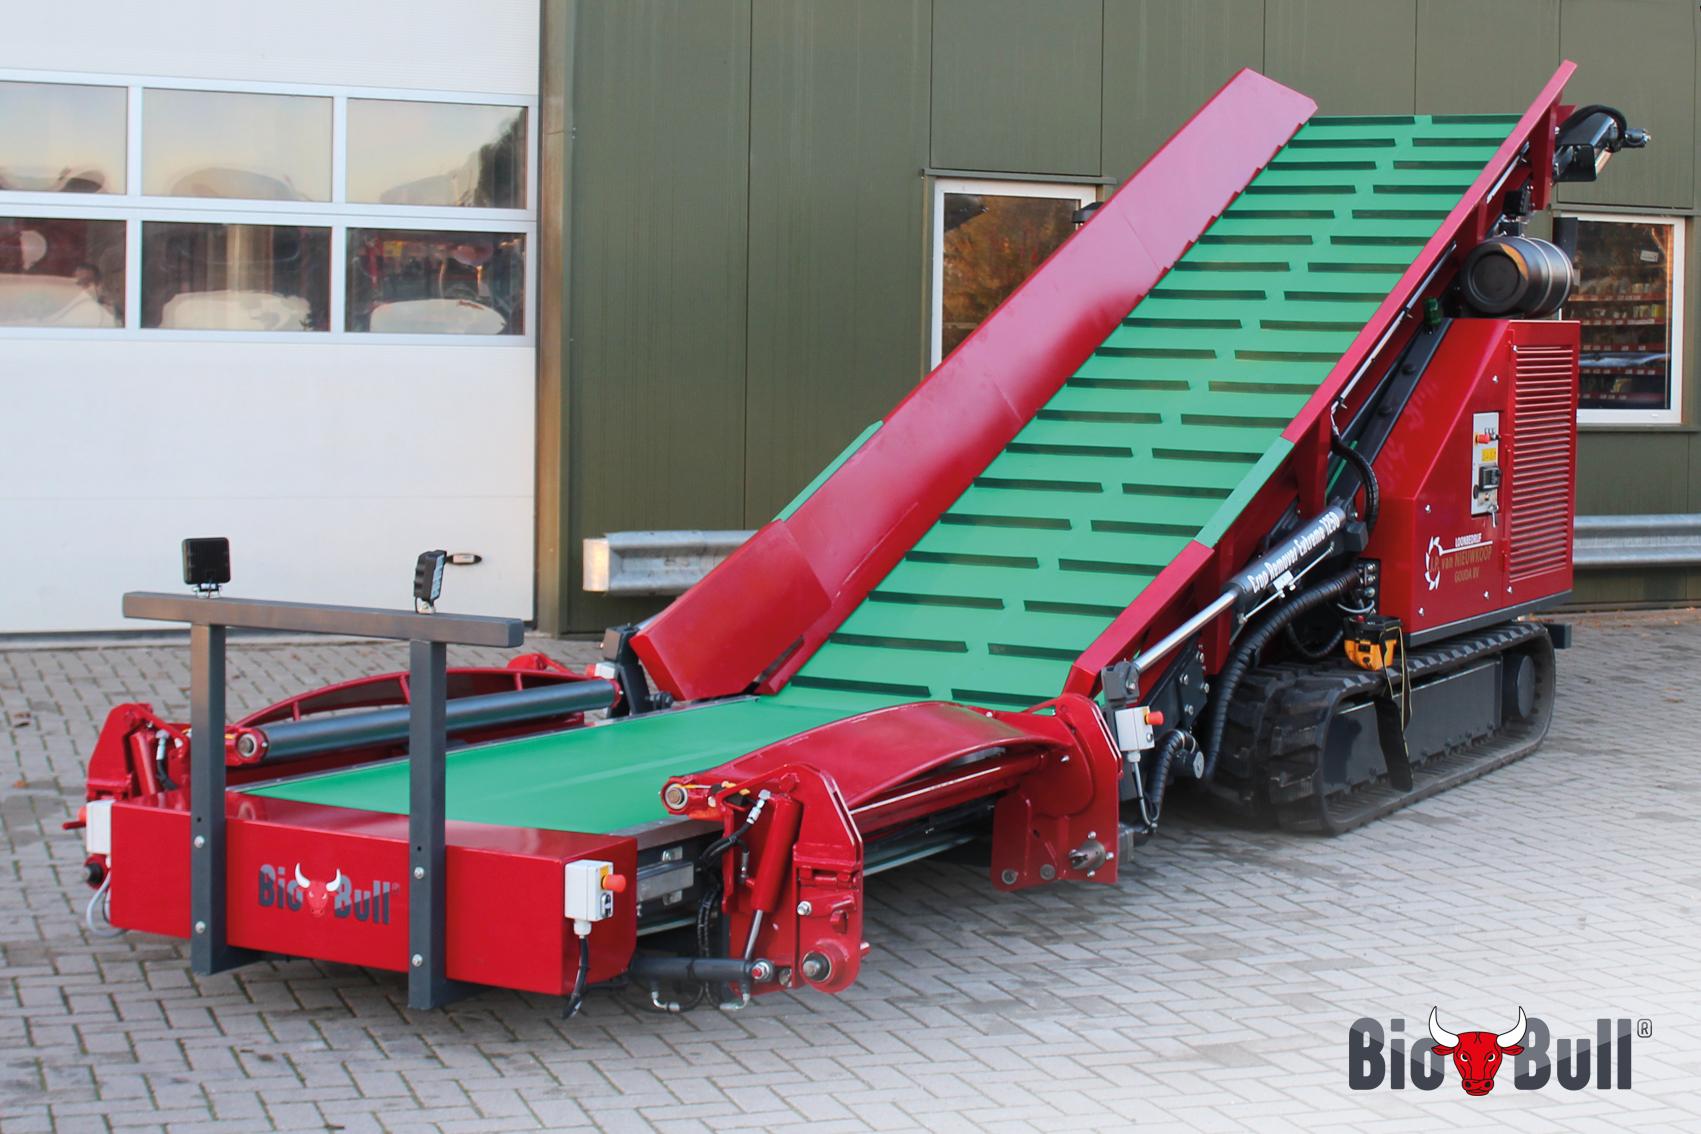 Bio Bull Crop Remover Extreme